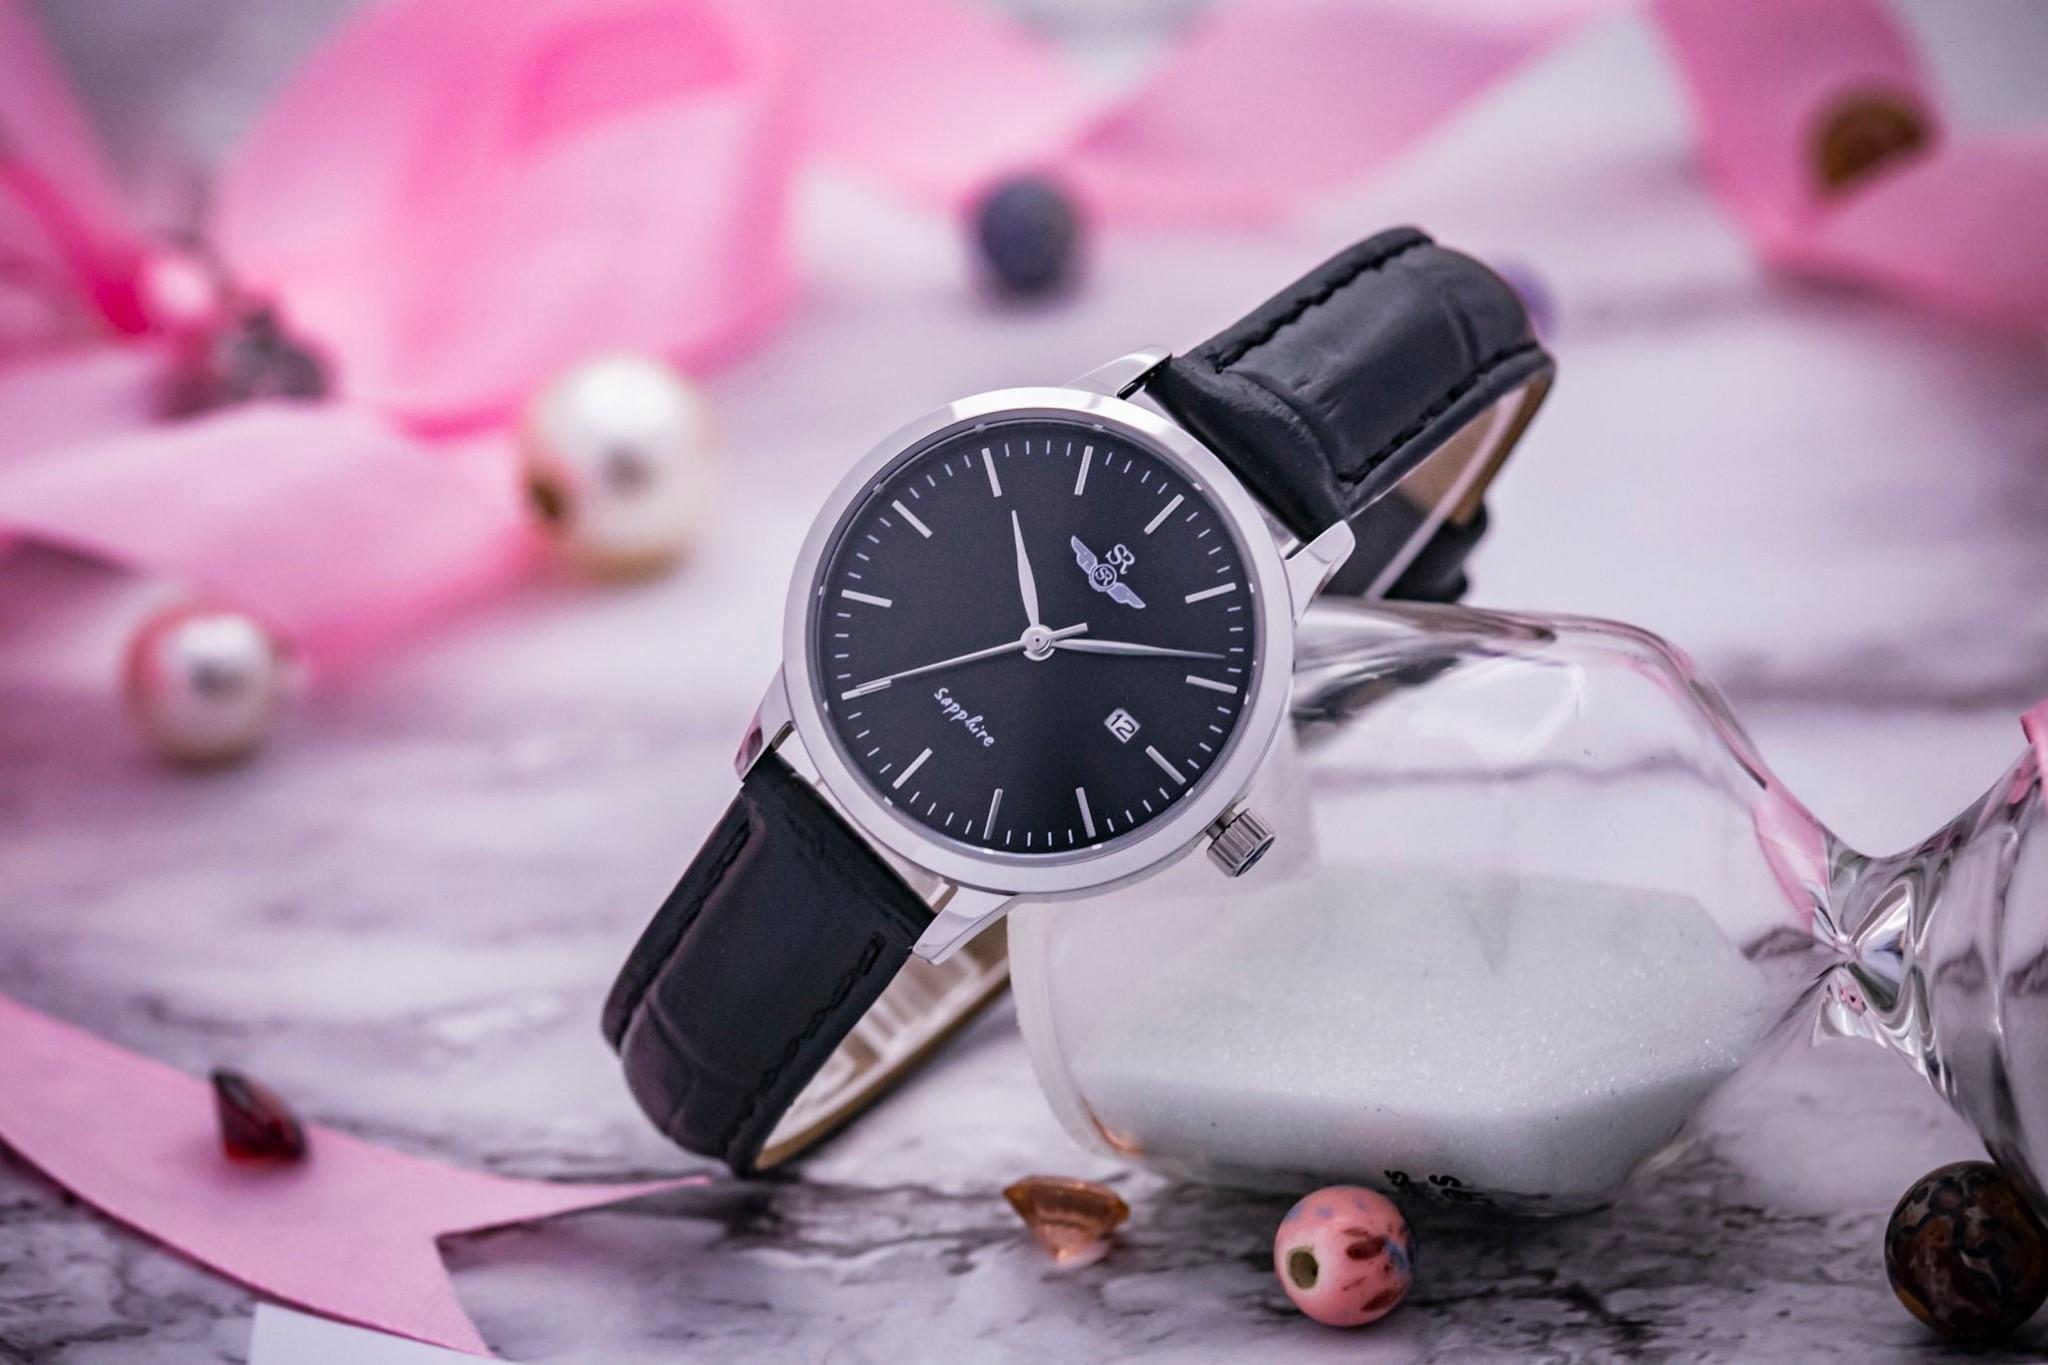 mua đồng hồ nữ Nhật Bản